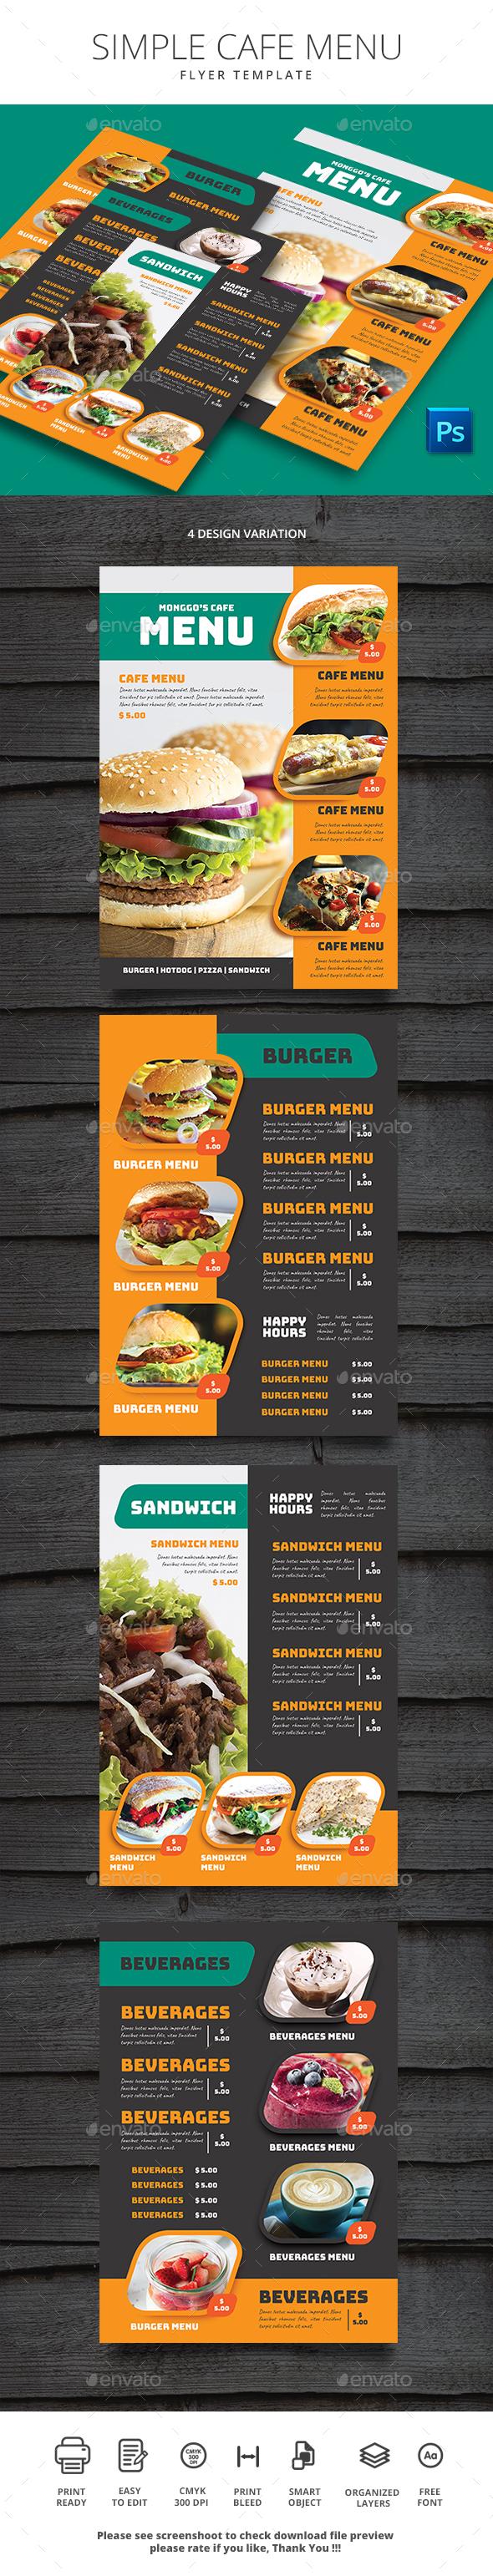 Simple Cafe Menu - Food Menus Print Templates